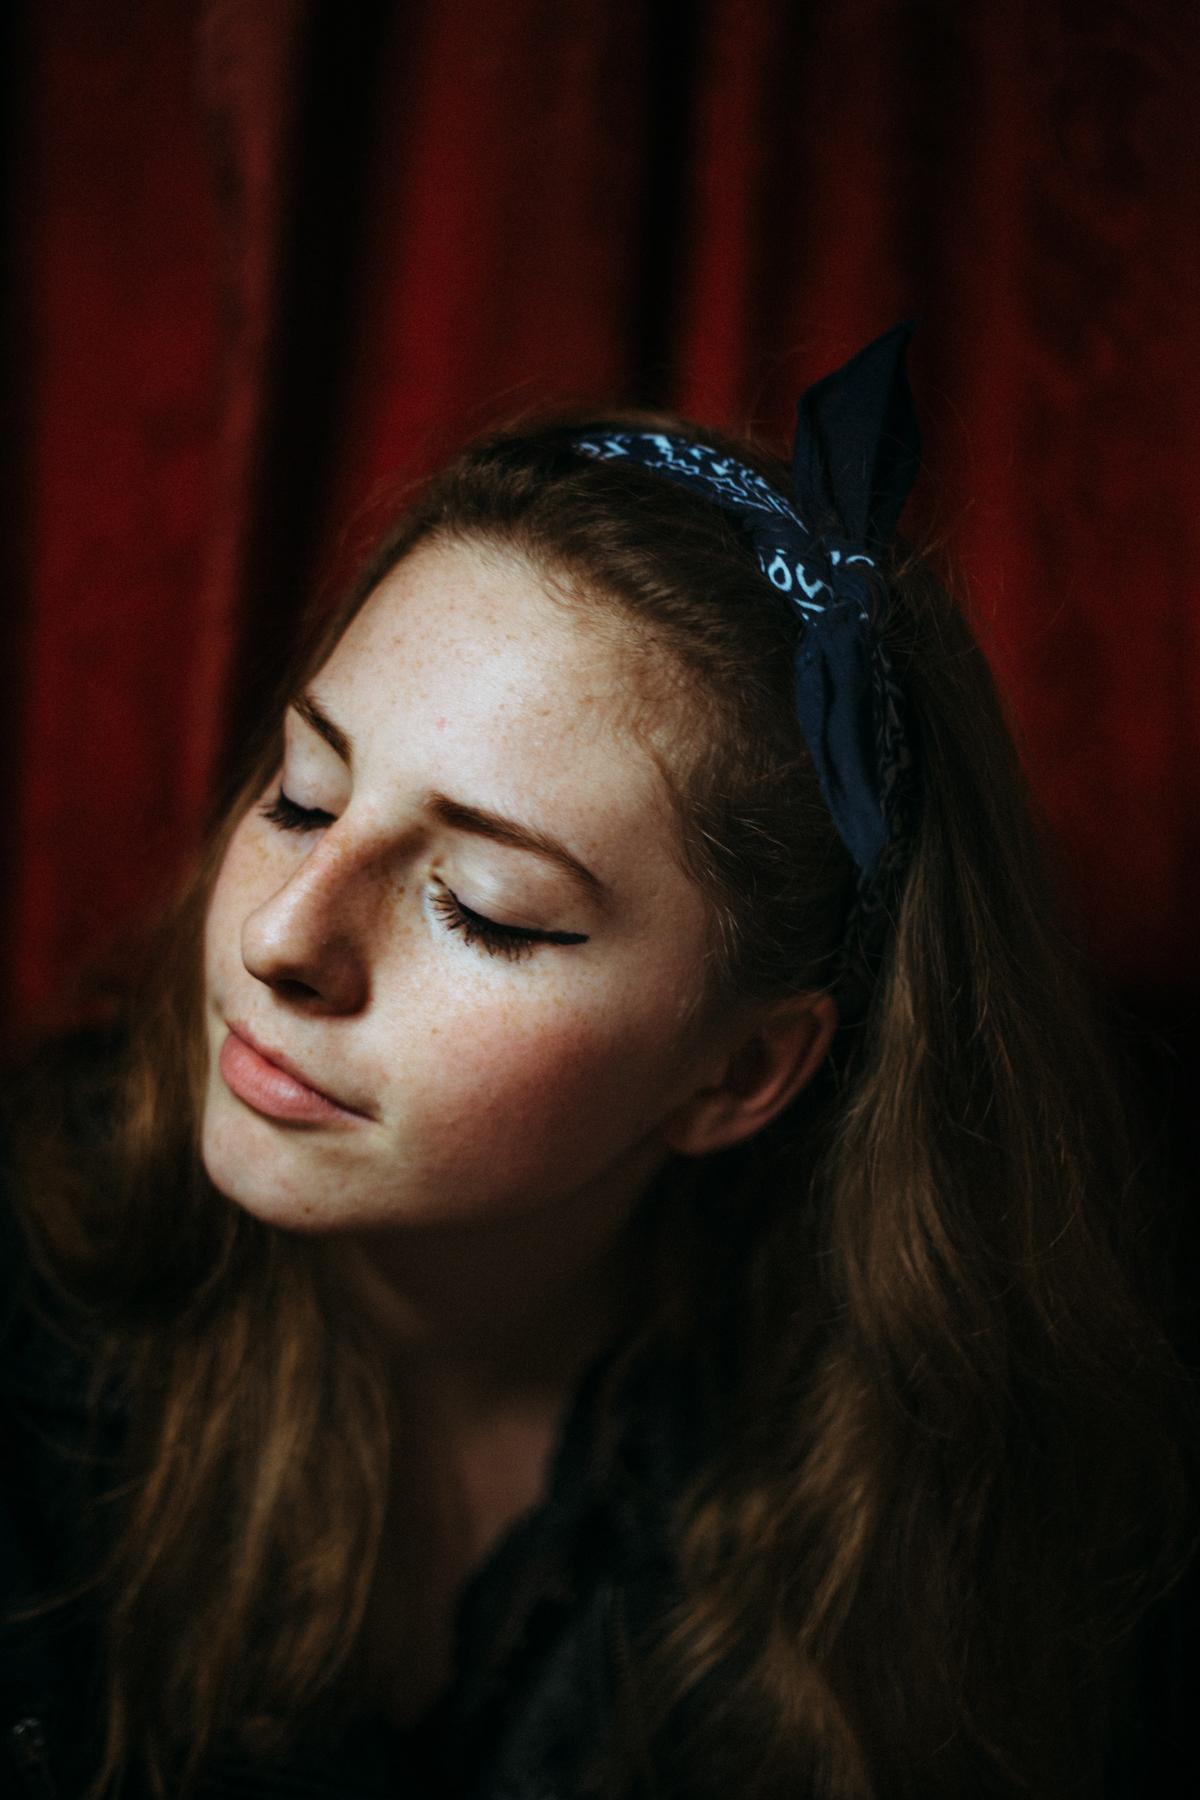 Kat Terek – Photography and Other Miracles www.katterek.com